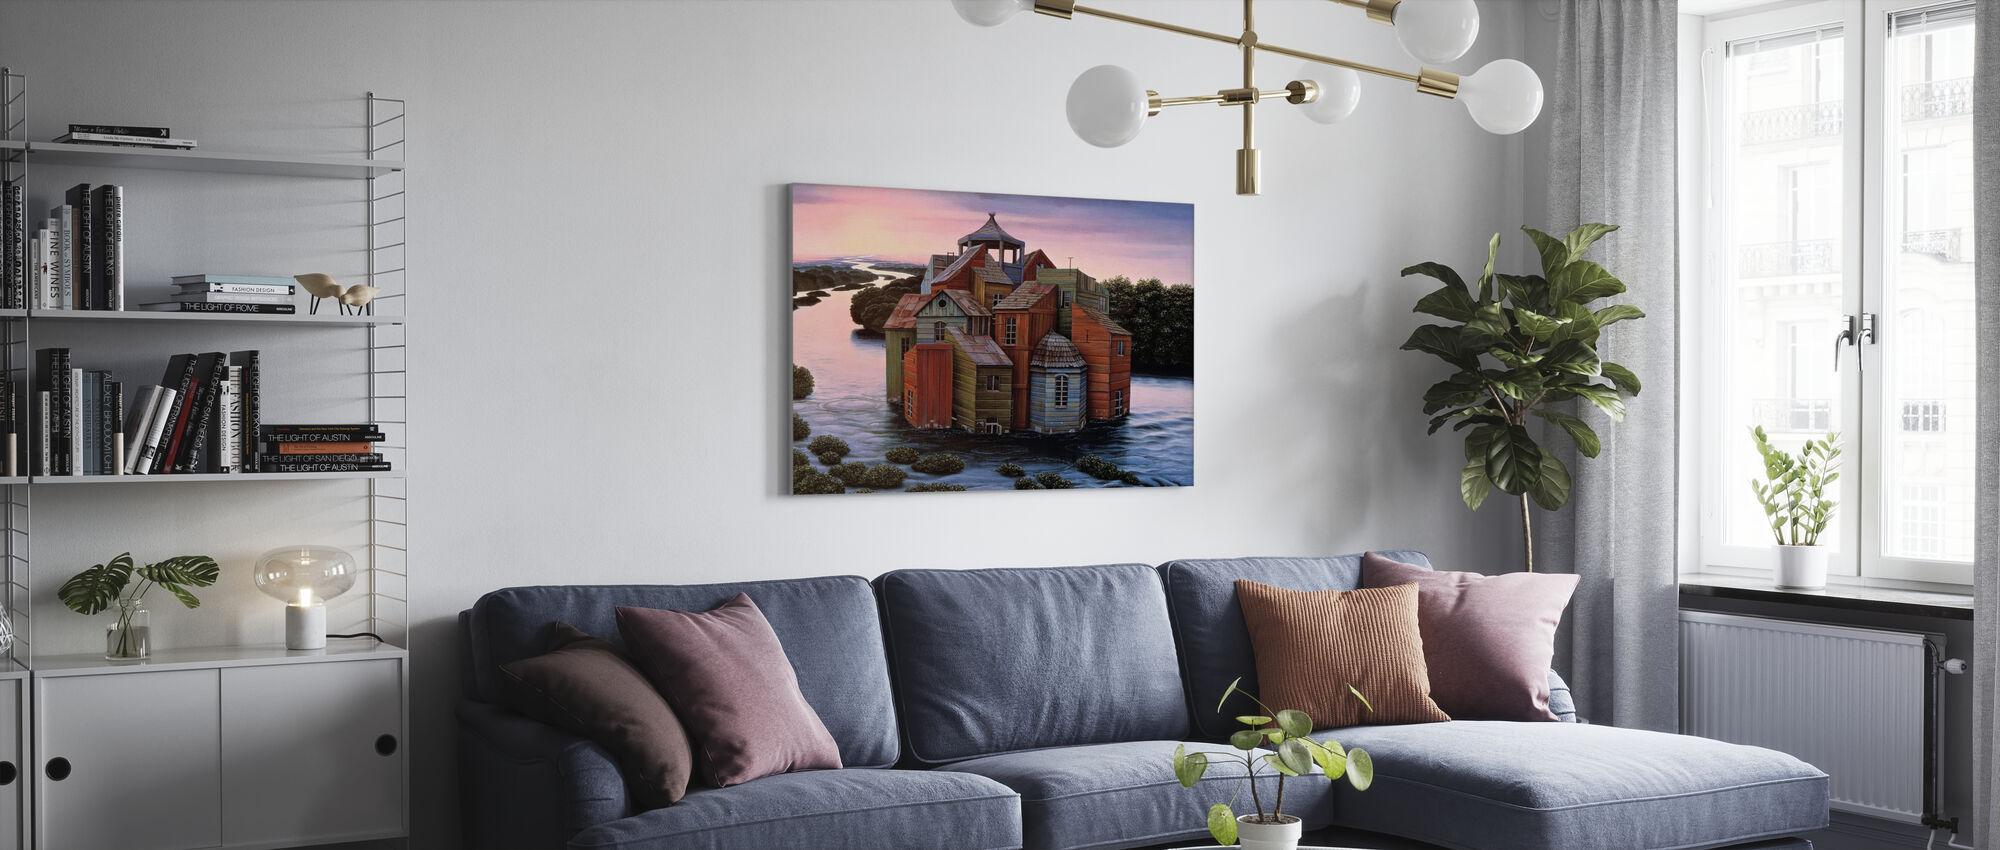 Fallingwater Landgoed - Canvas print - Woonkamer